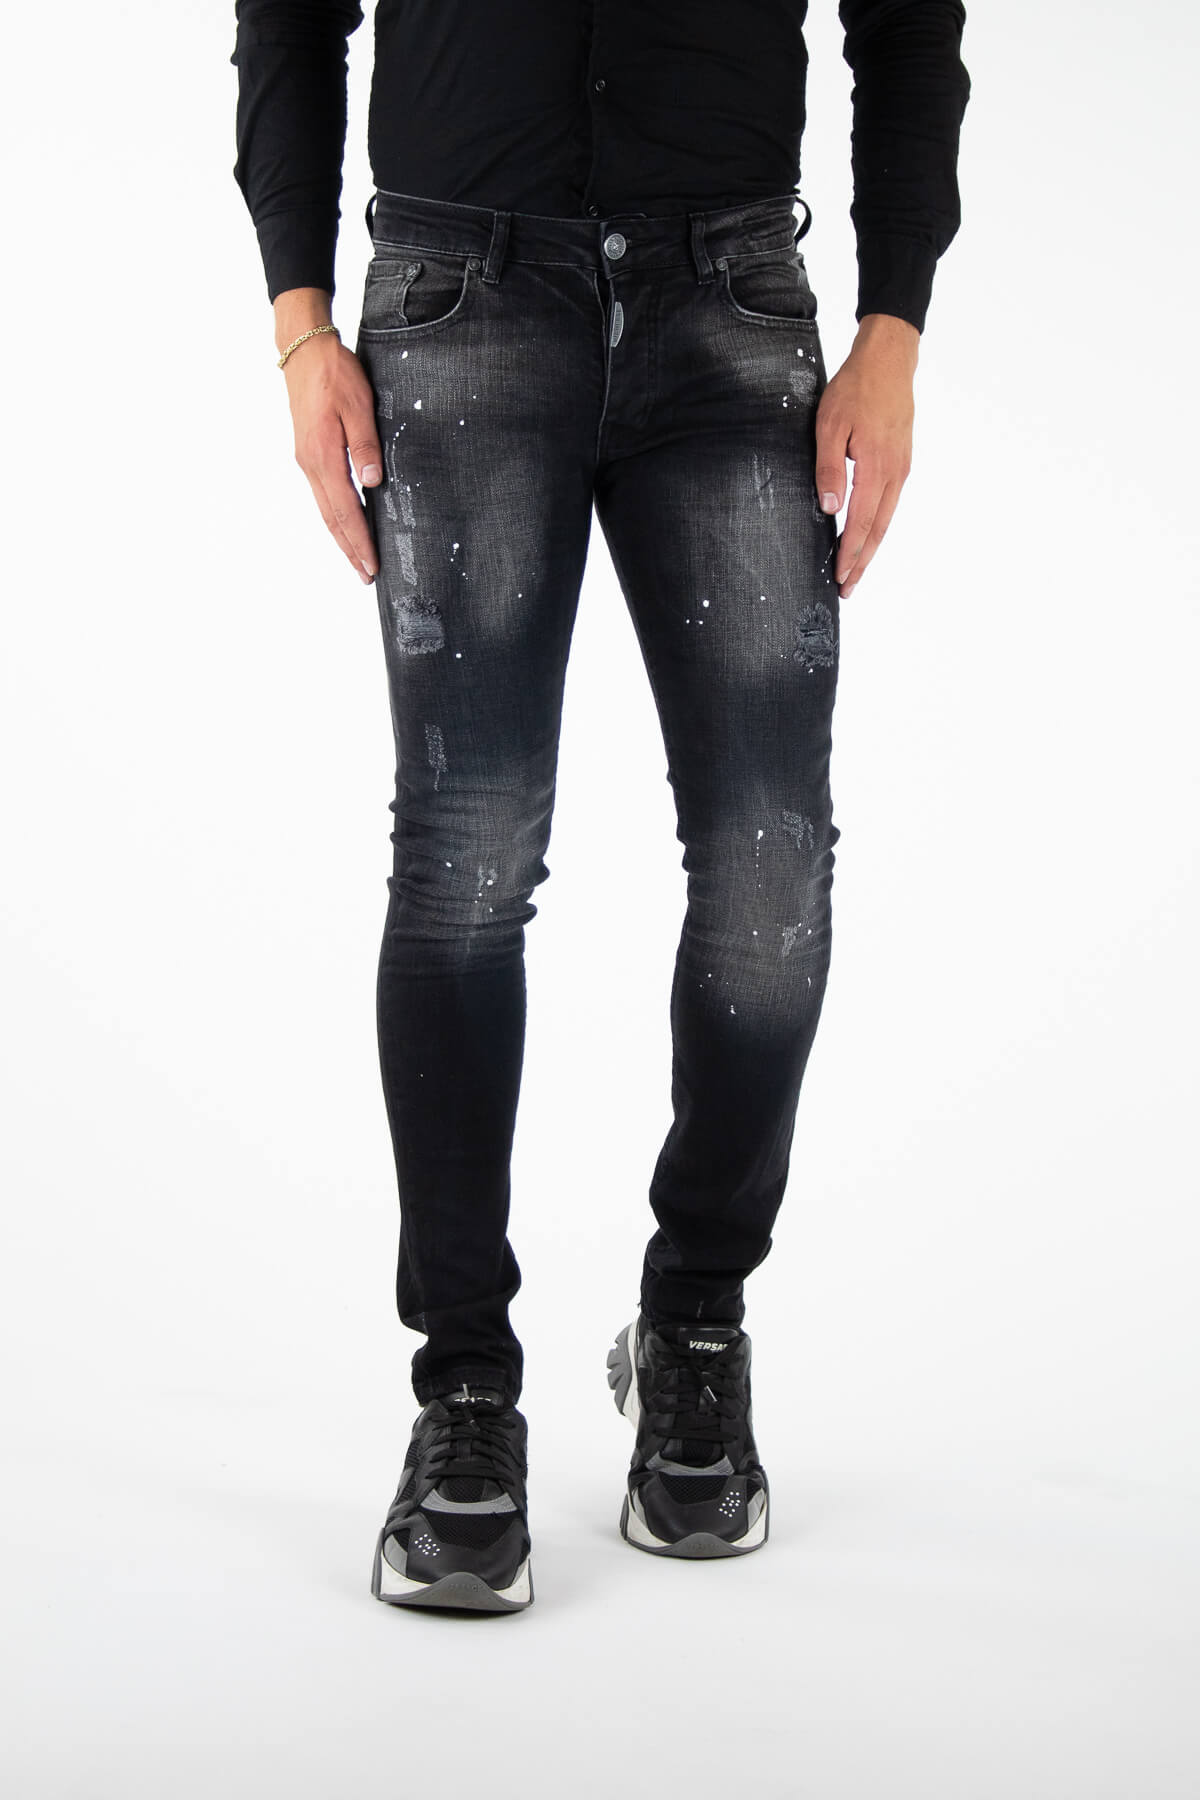 Alicante Deluxe Black Jeans-1